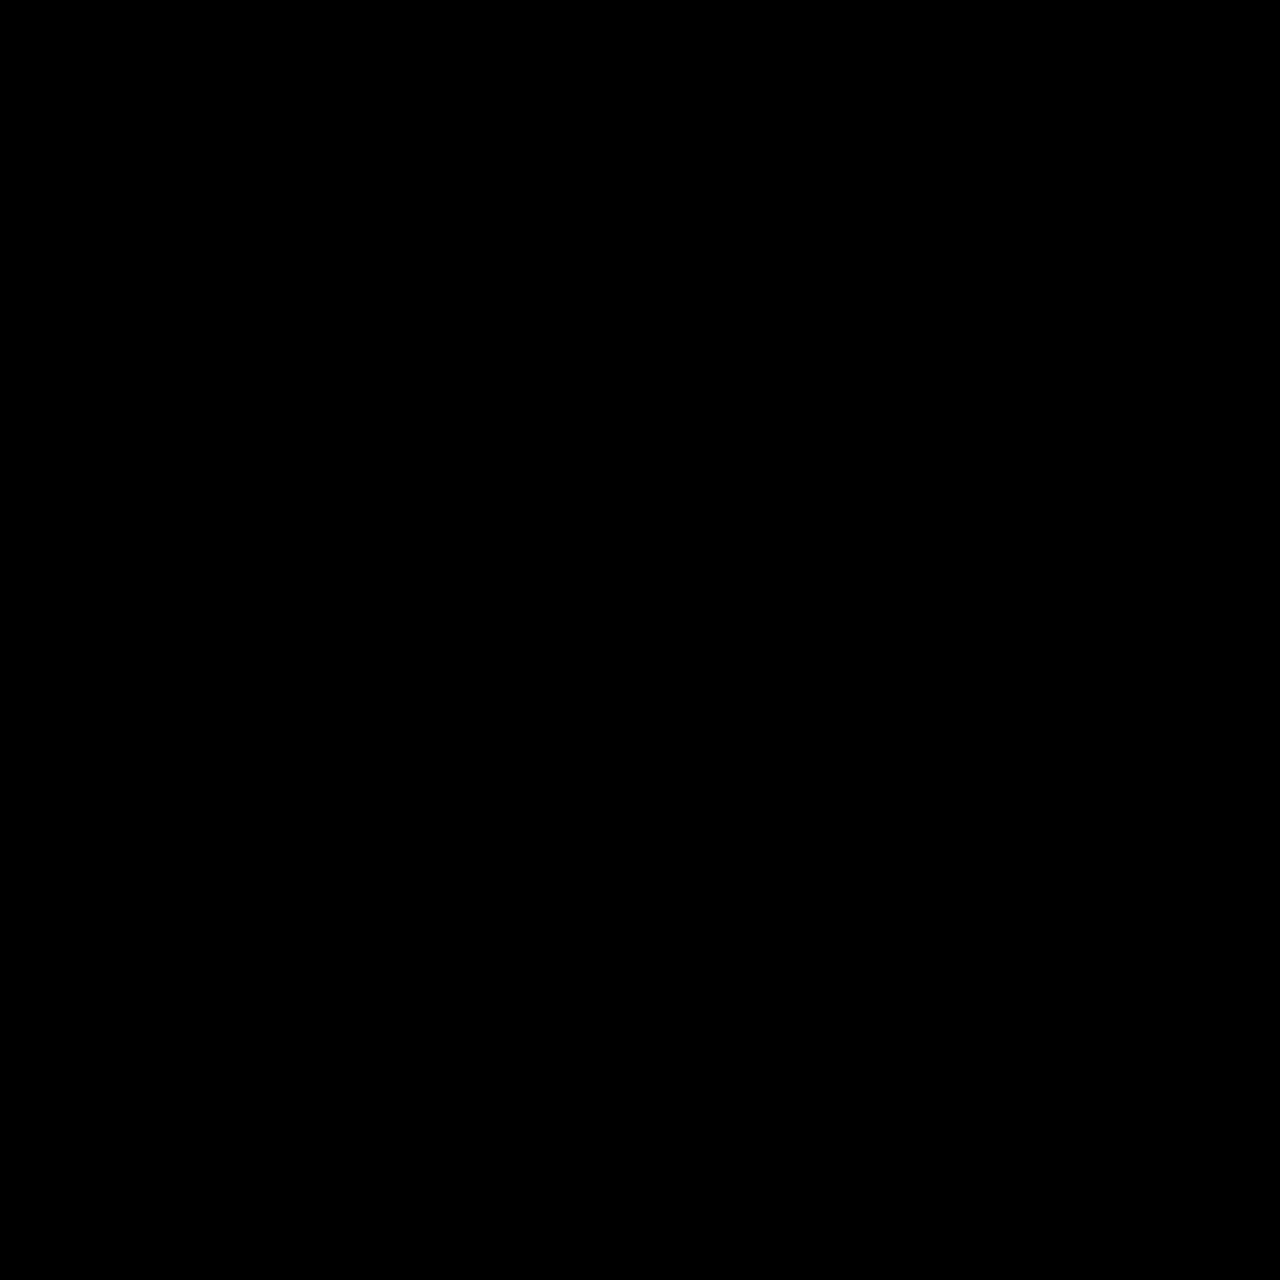 creative-control-black-50x50